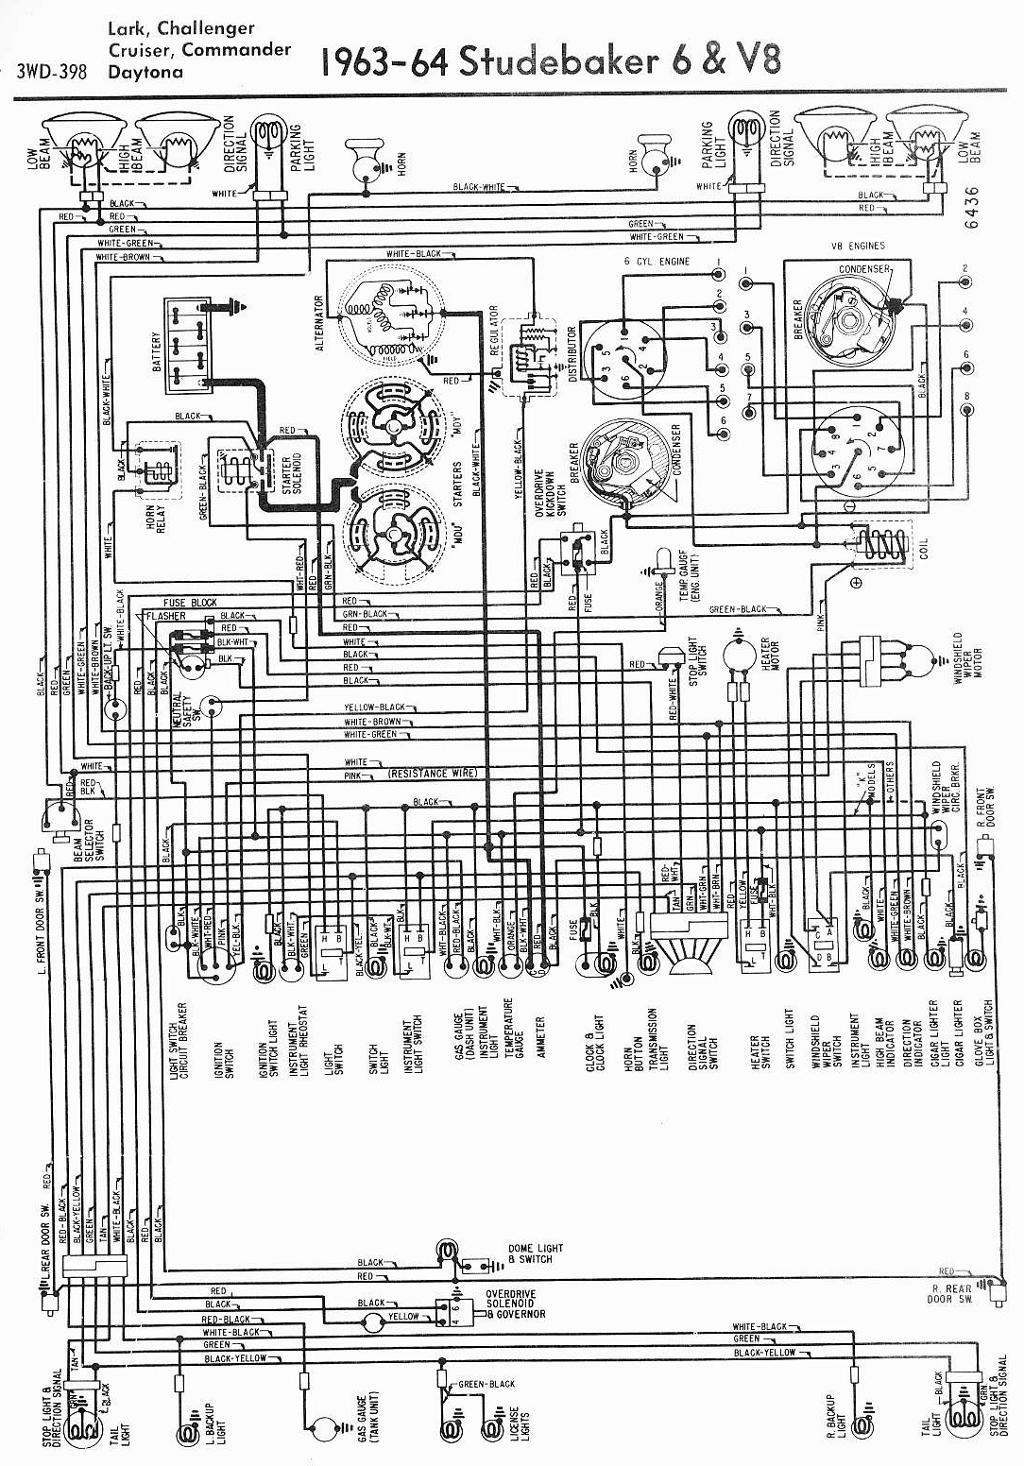 1963 avanti wiring diagram auto electrical wiring diagram u2022 rh 6weeks co uk